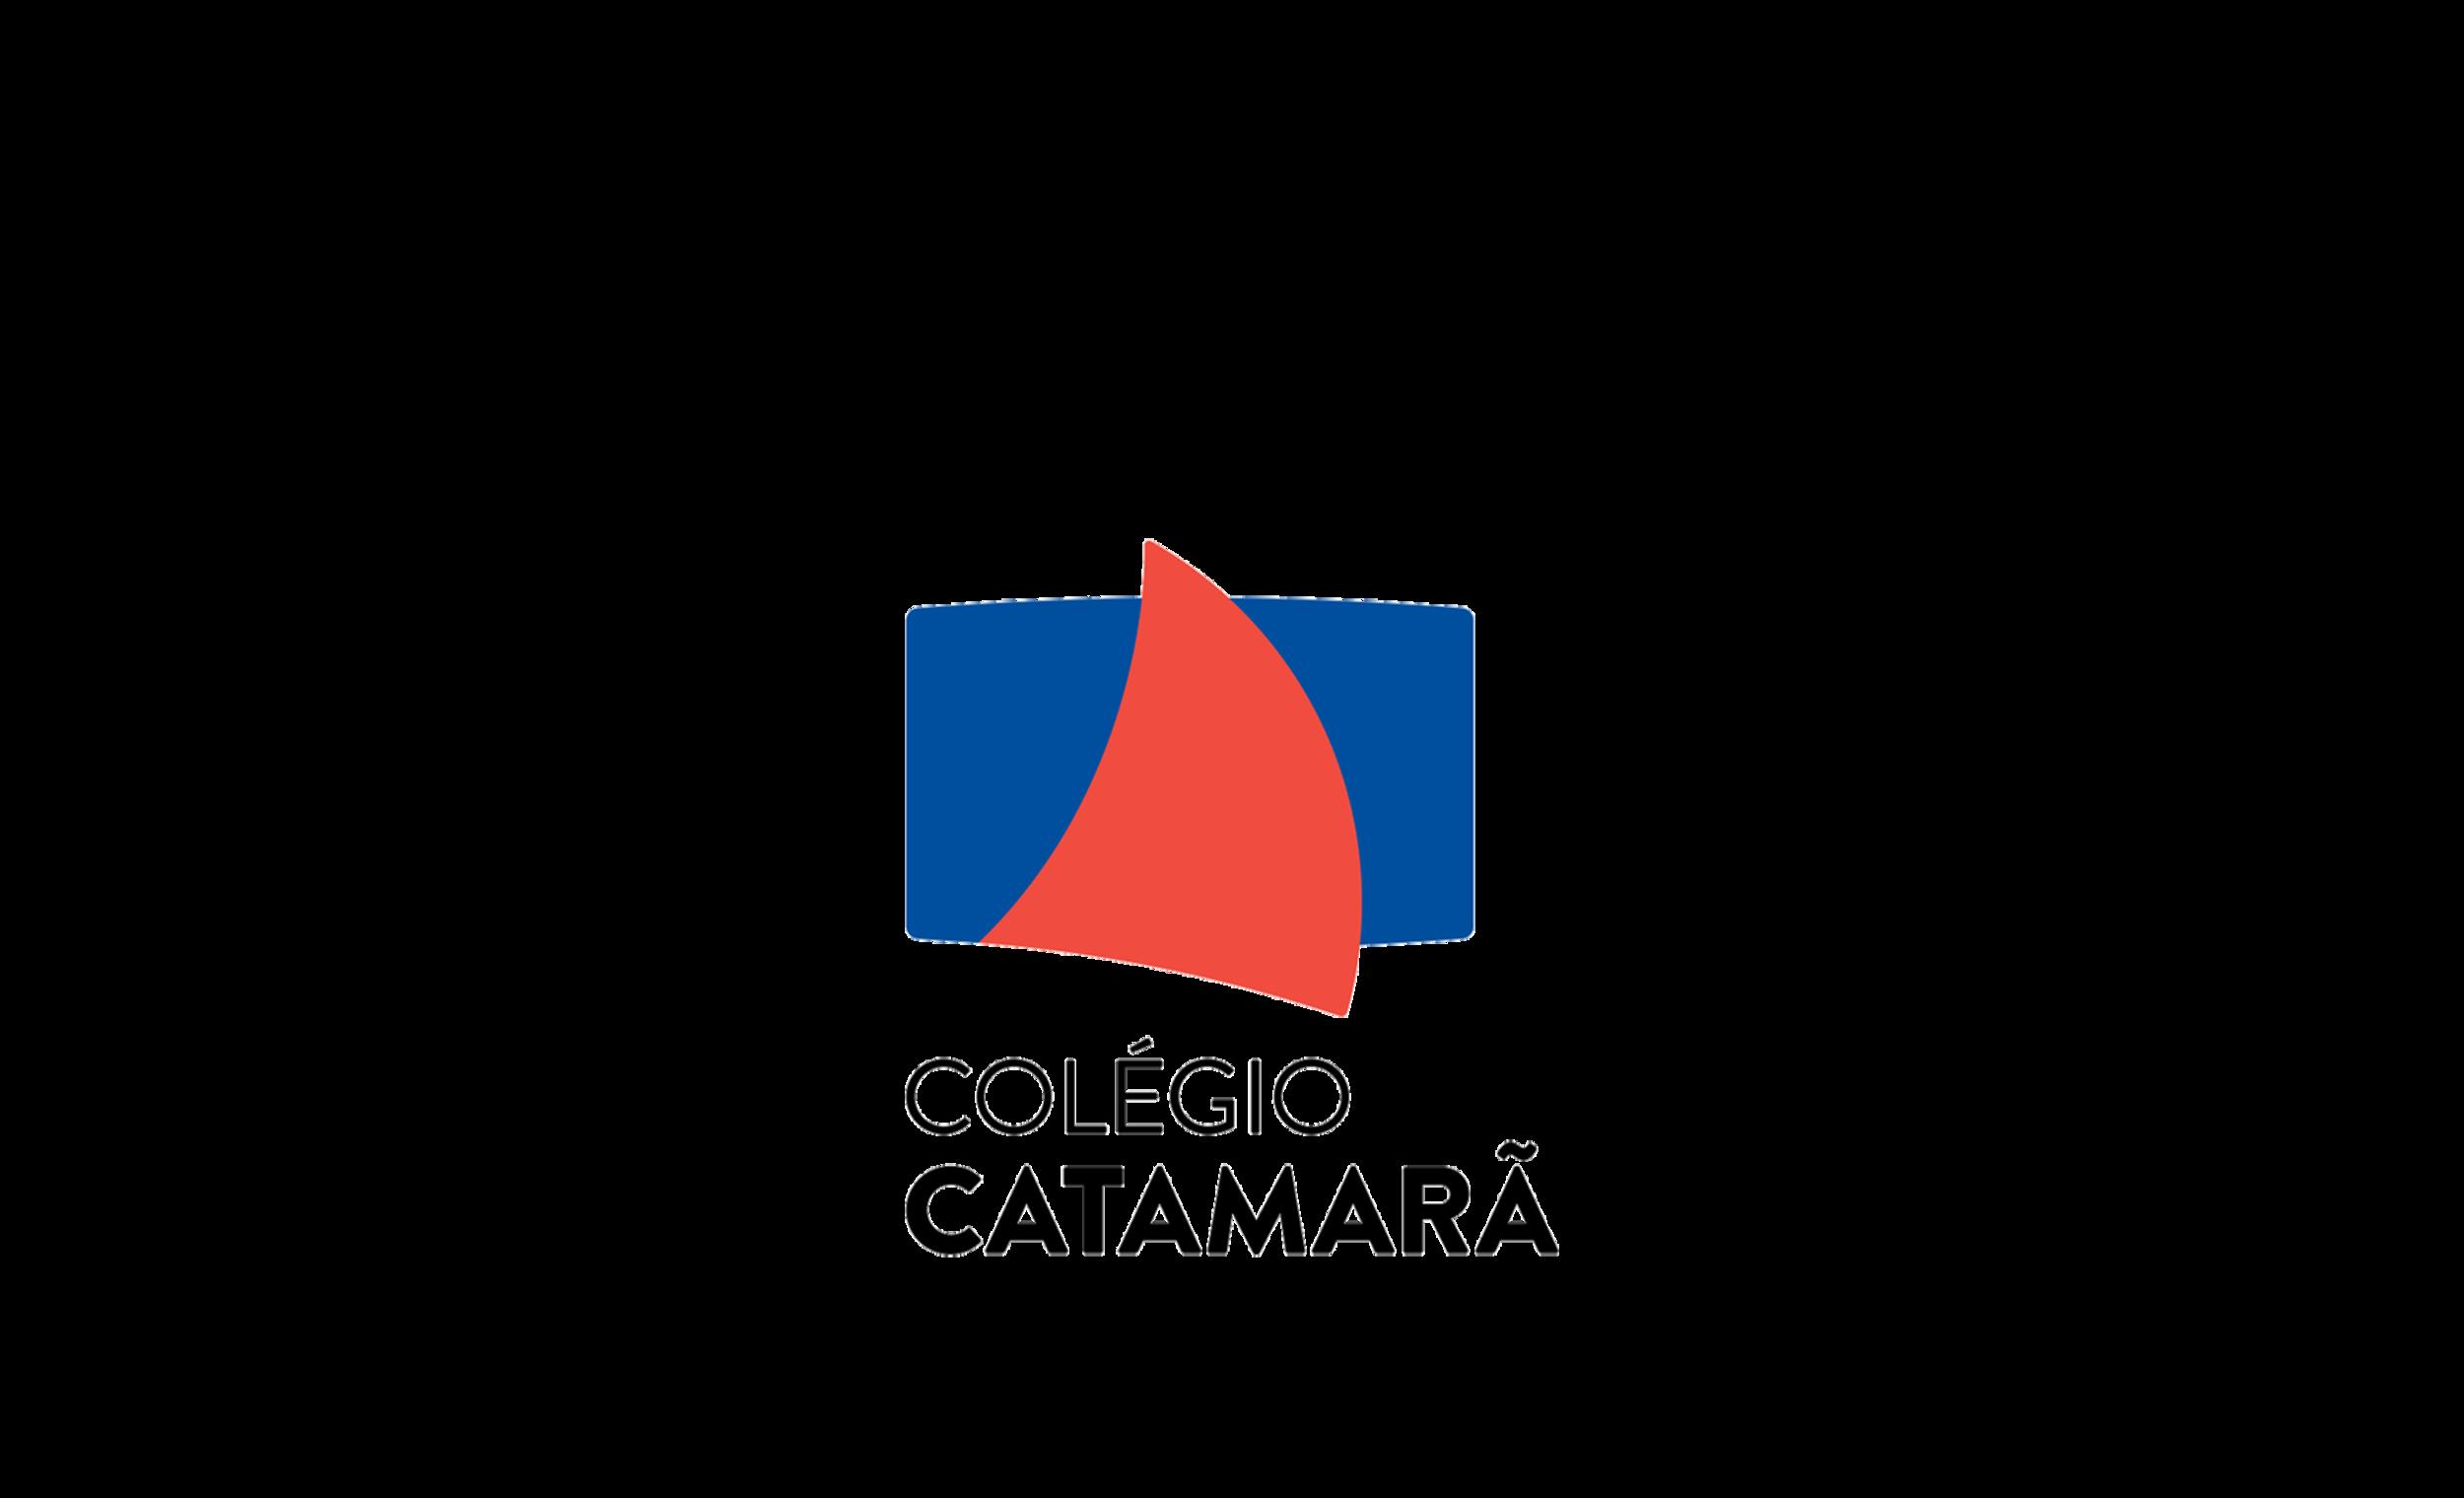 _0010_Catamarã.jpg.png./